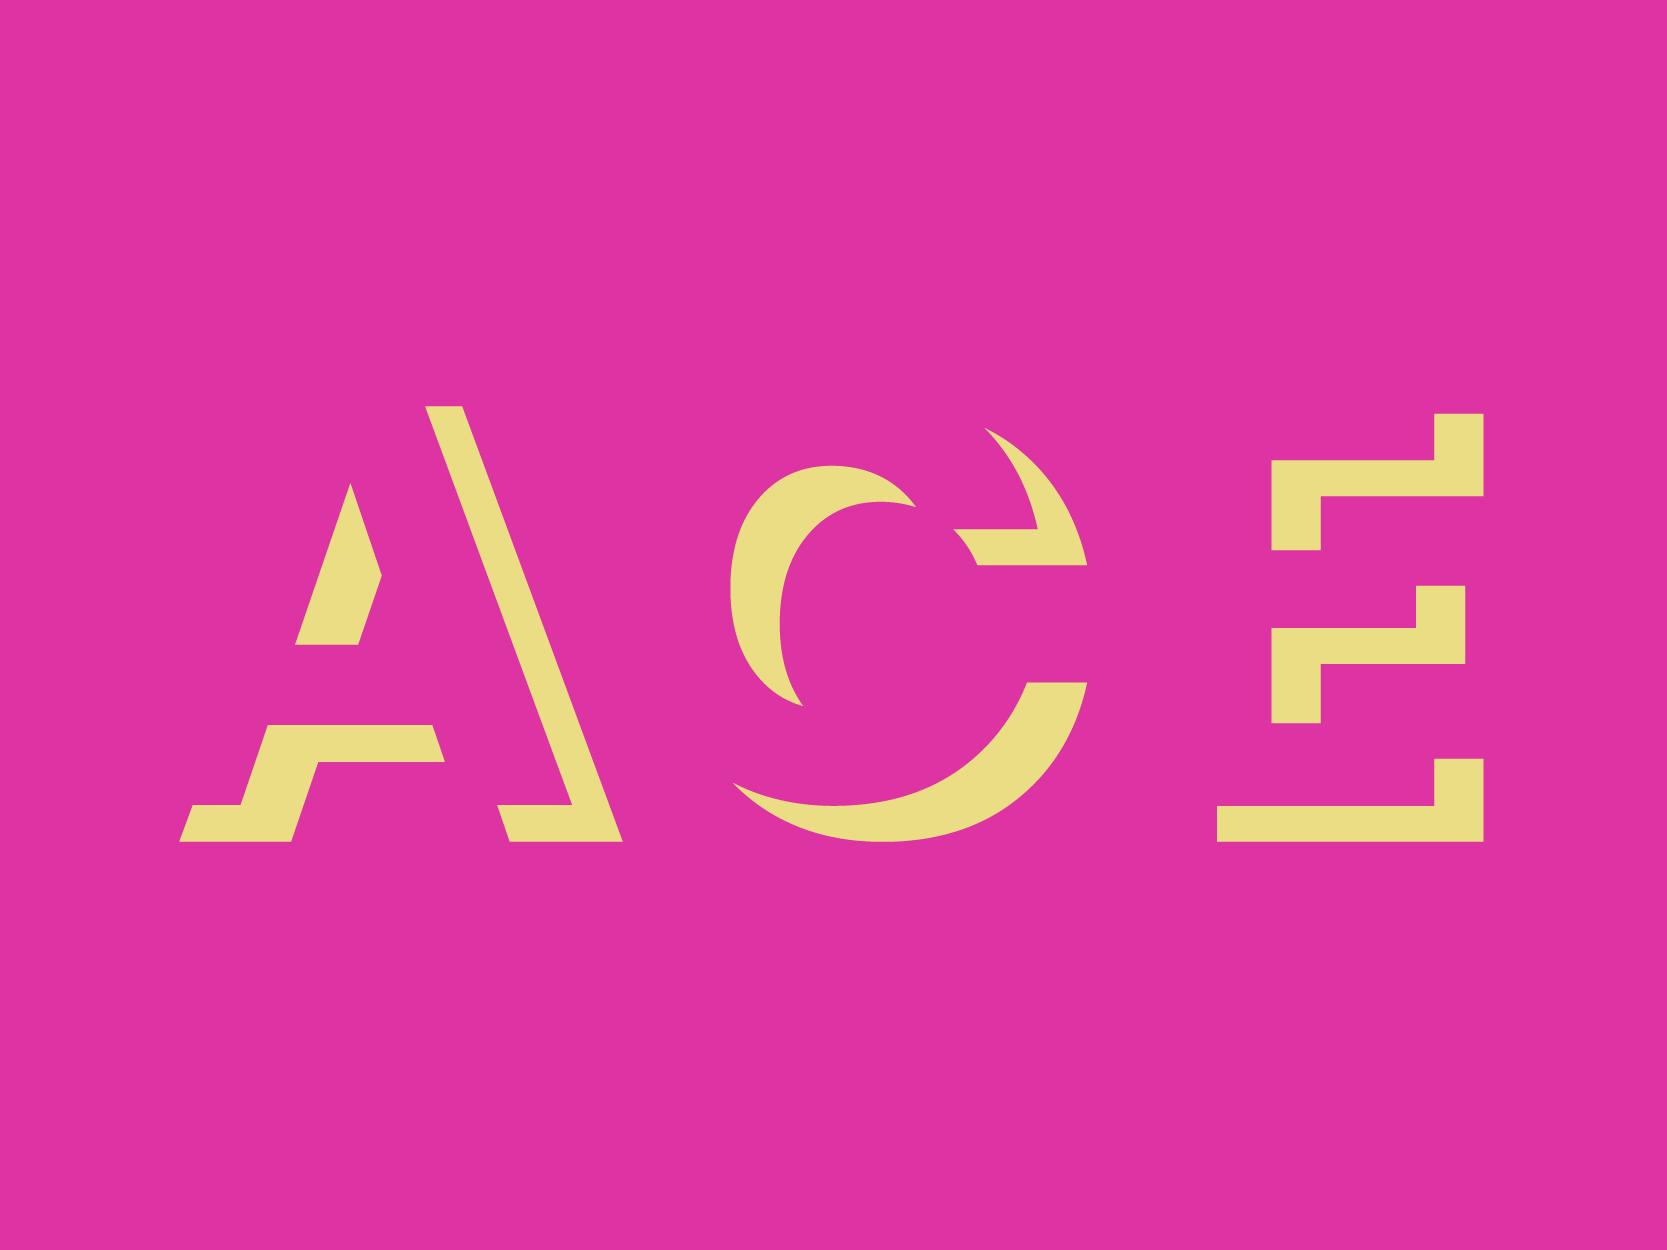 Ace dribbble logo 02